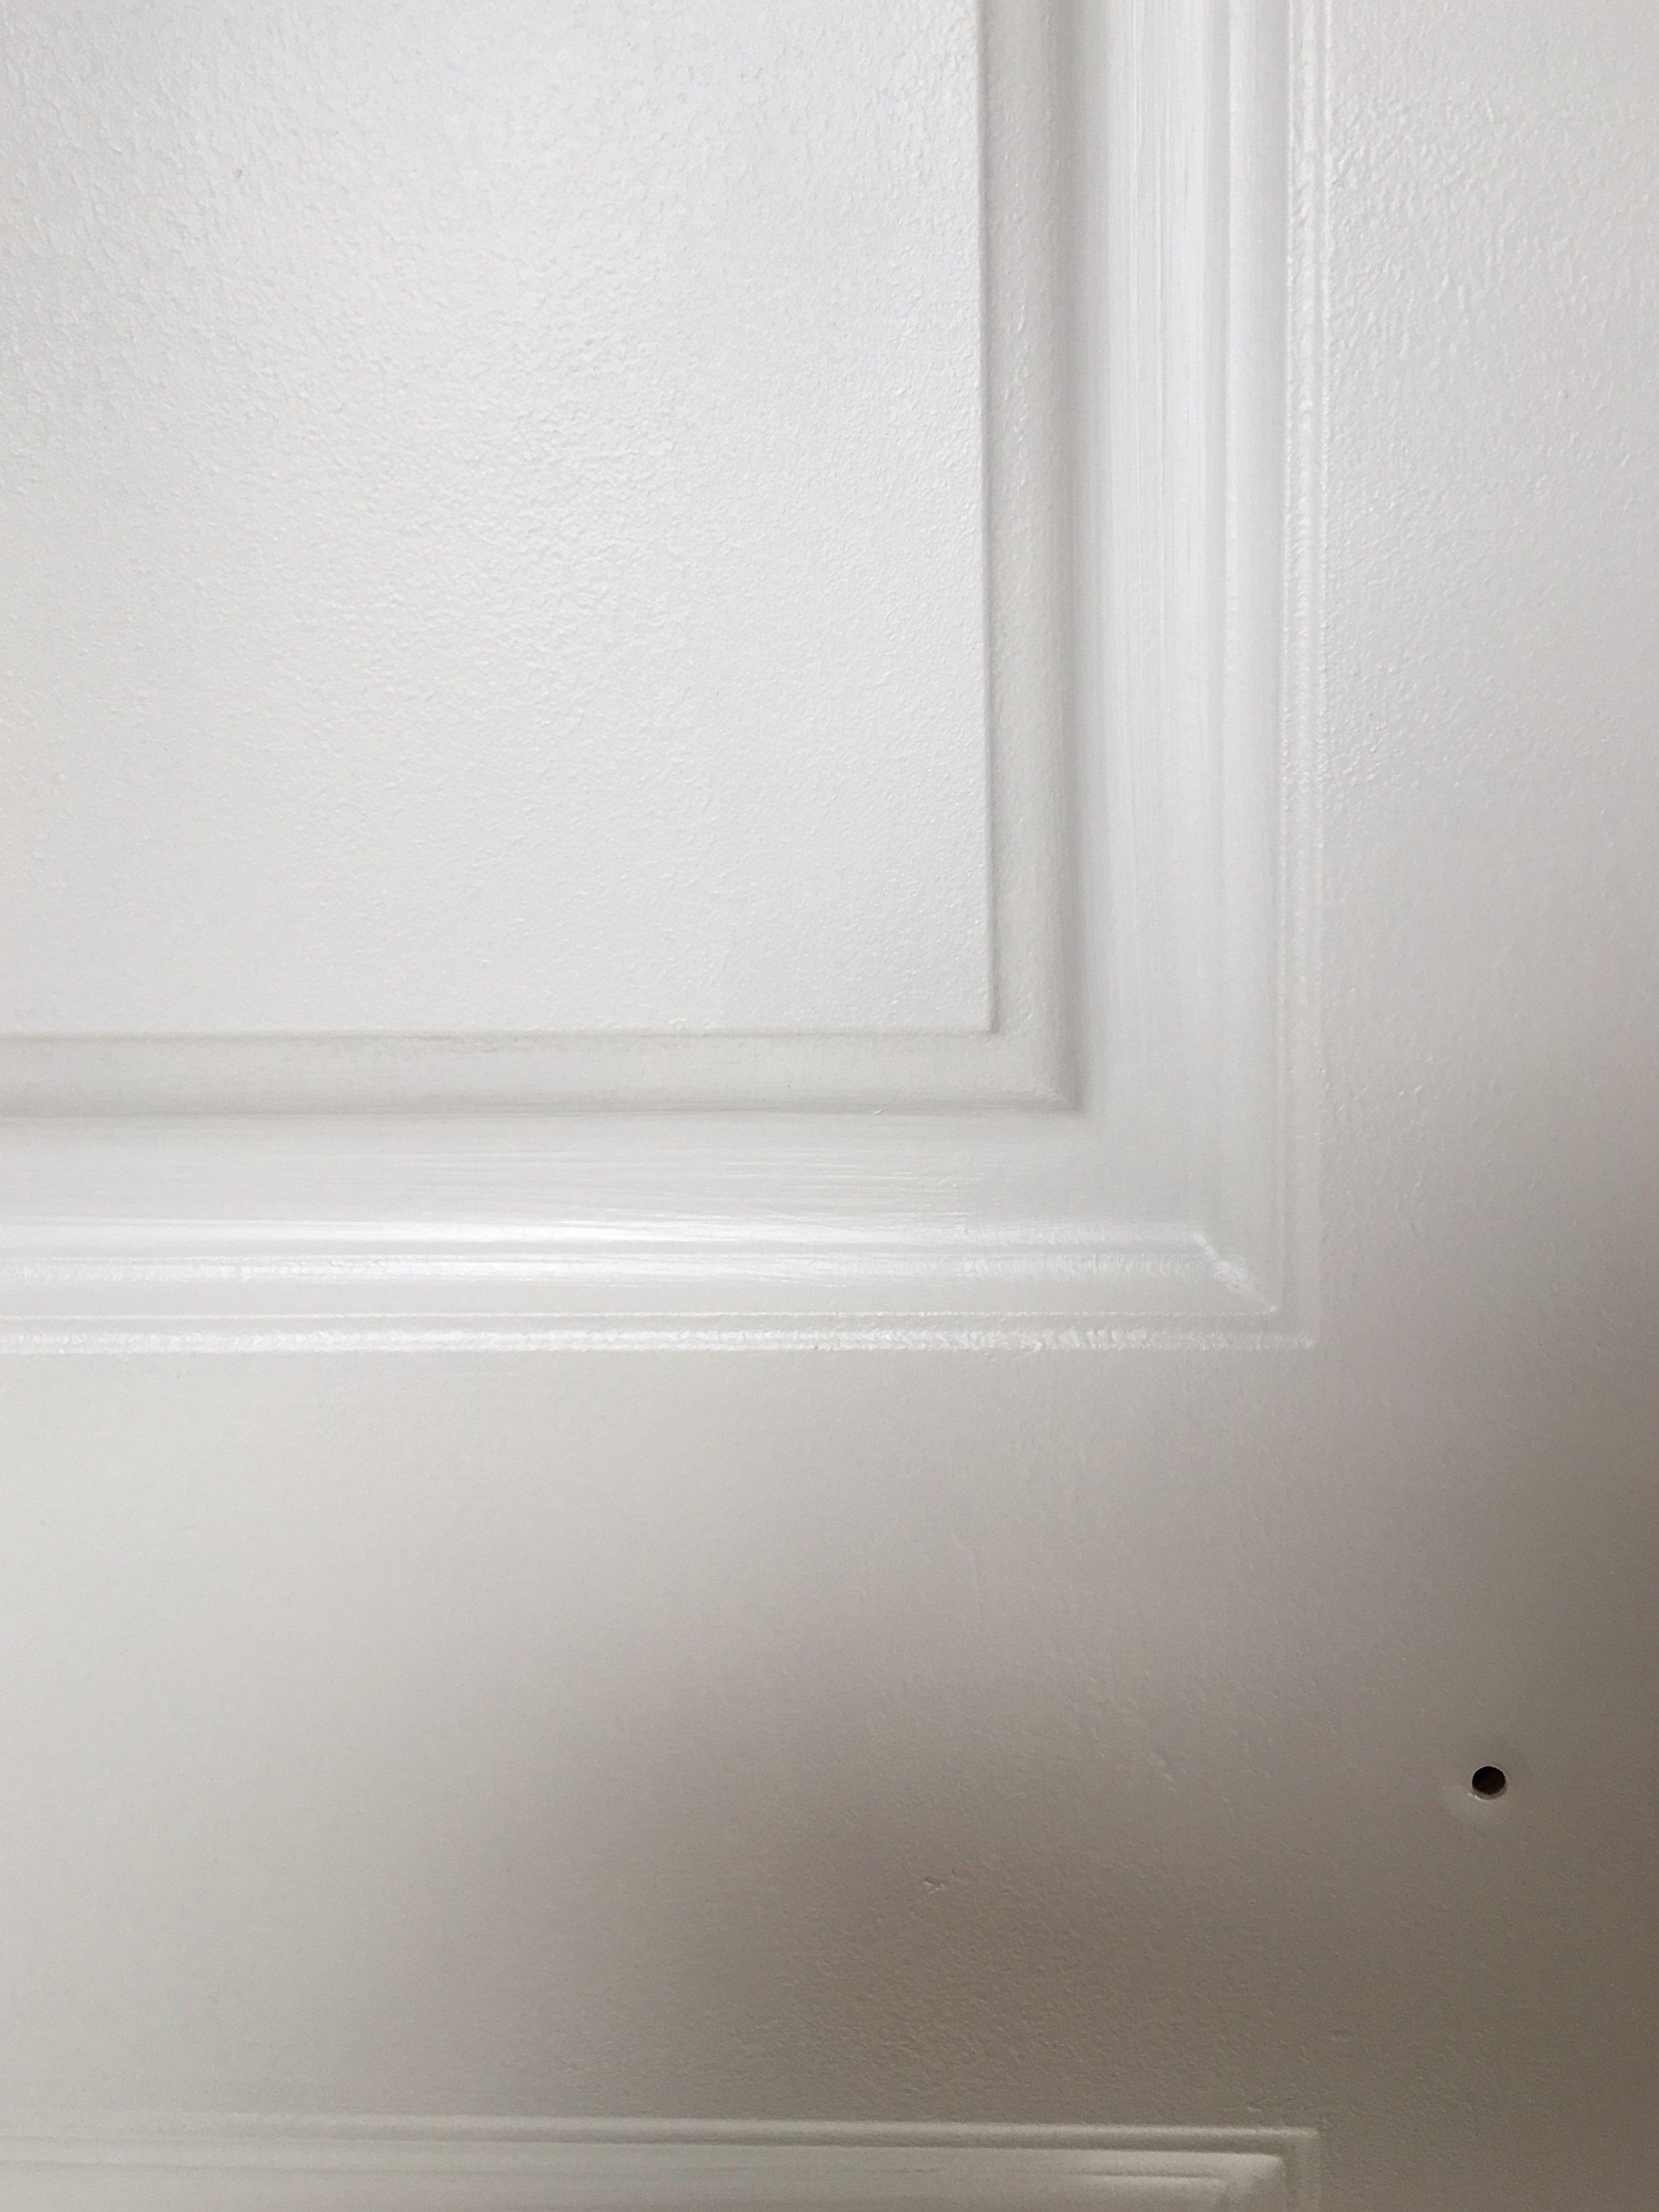 How To Paint Melamine Cupboards Melanie Lissack Interiors